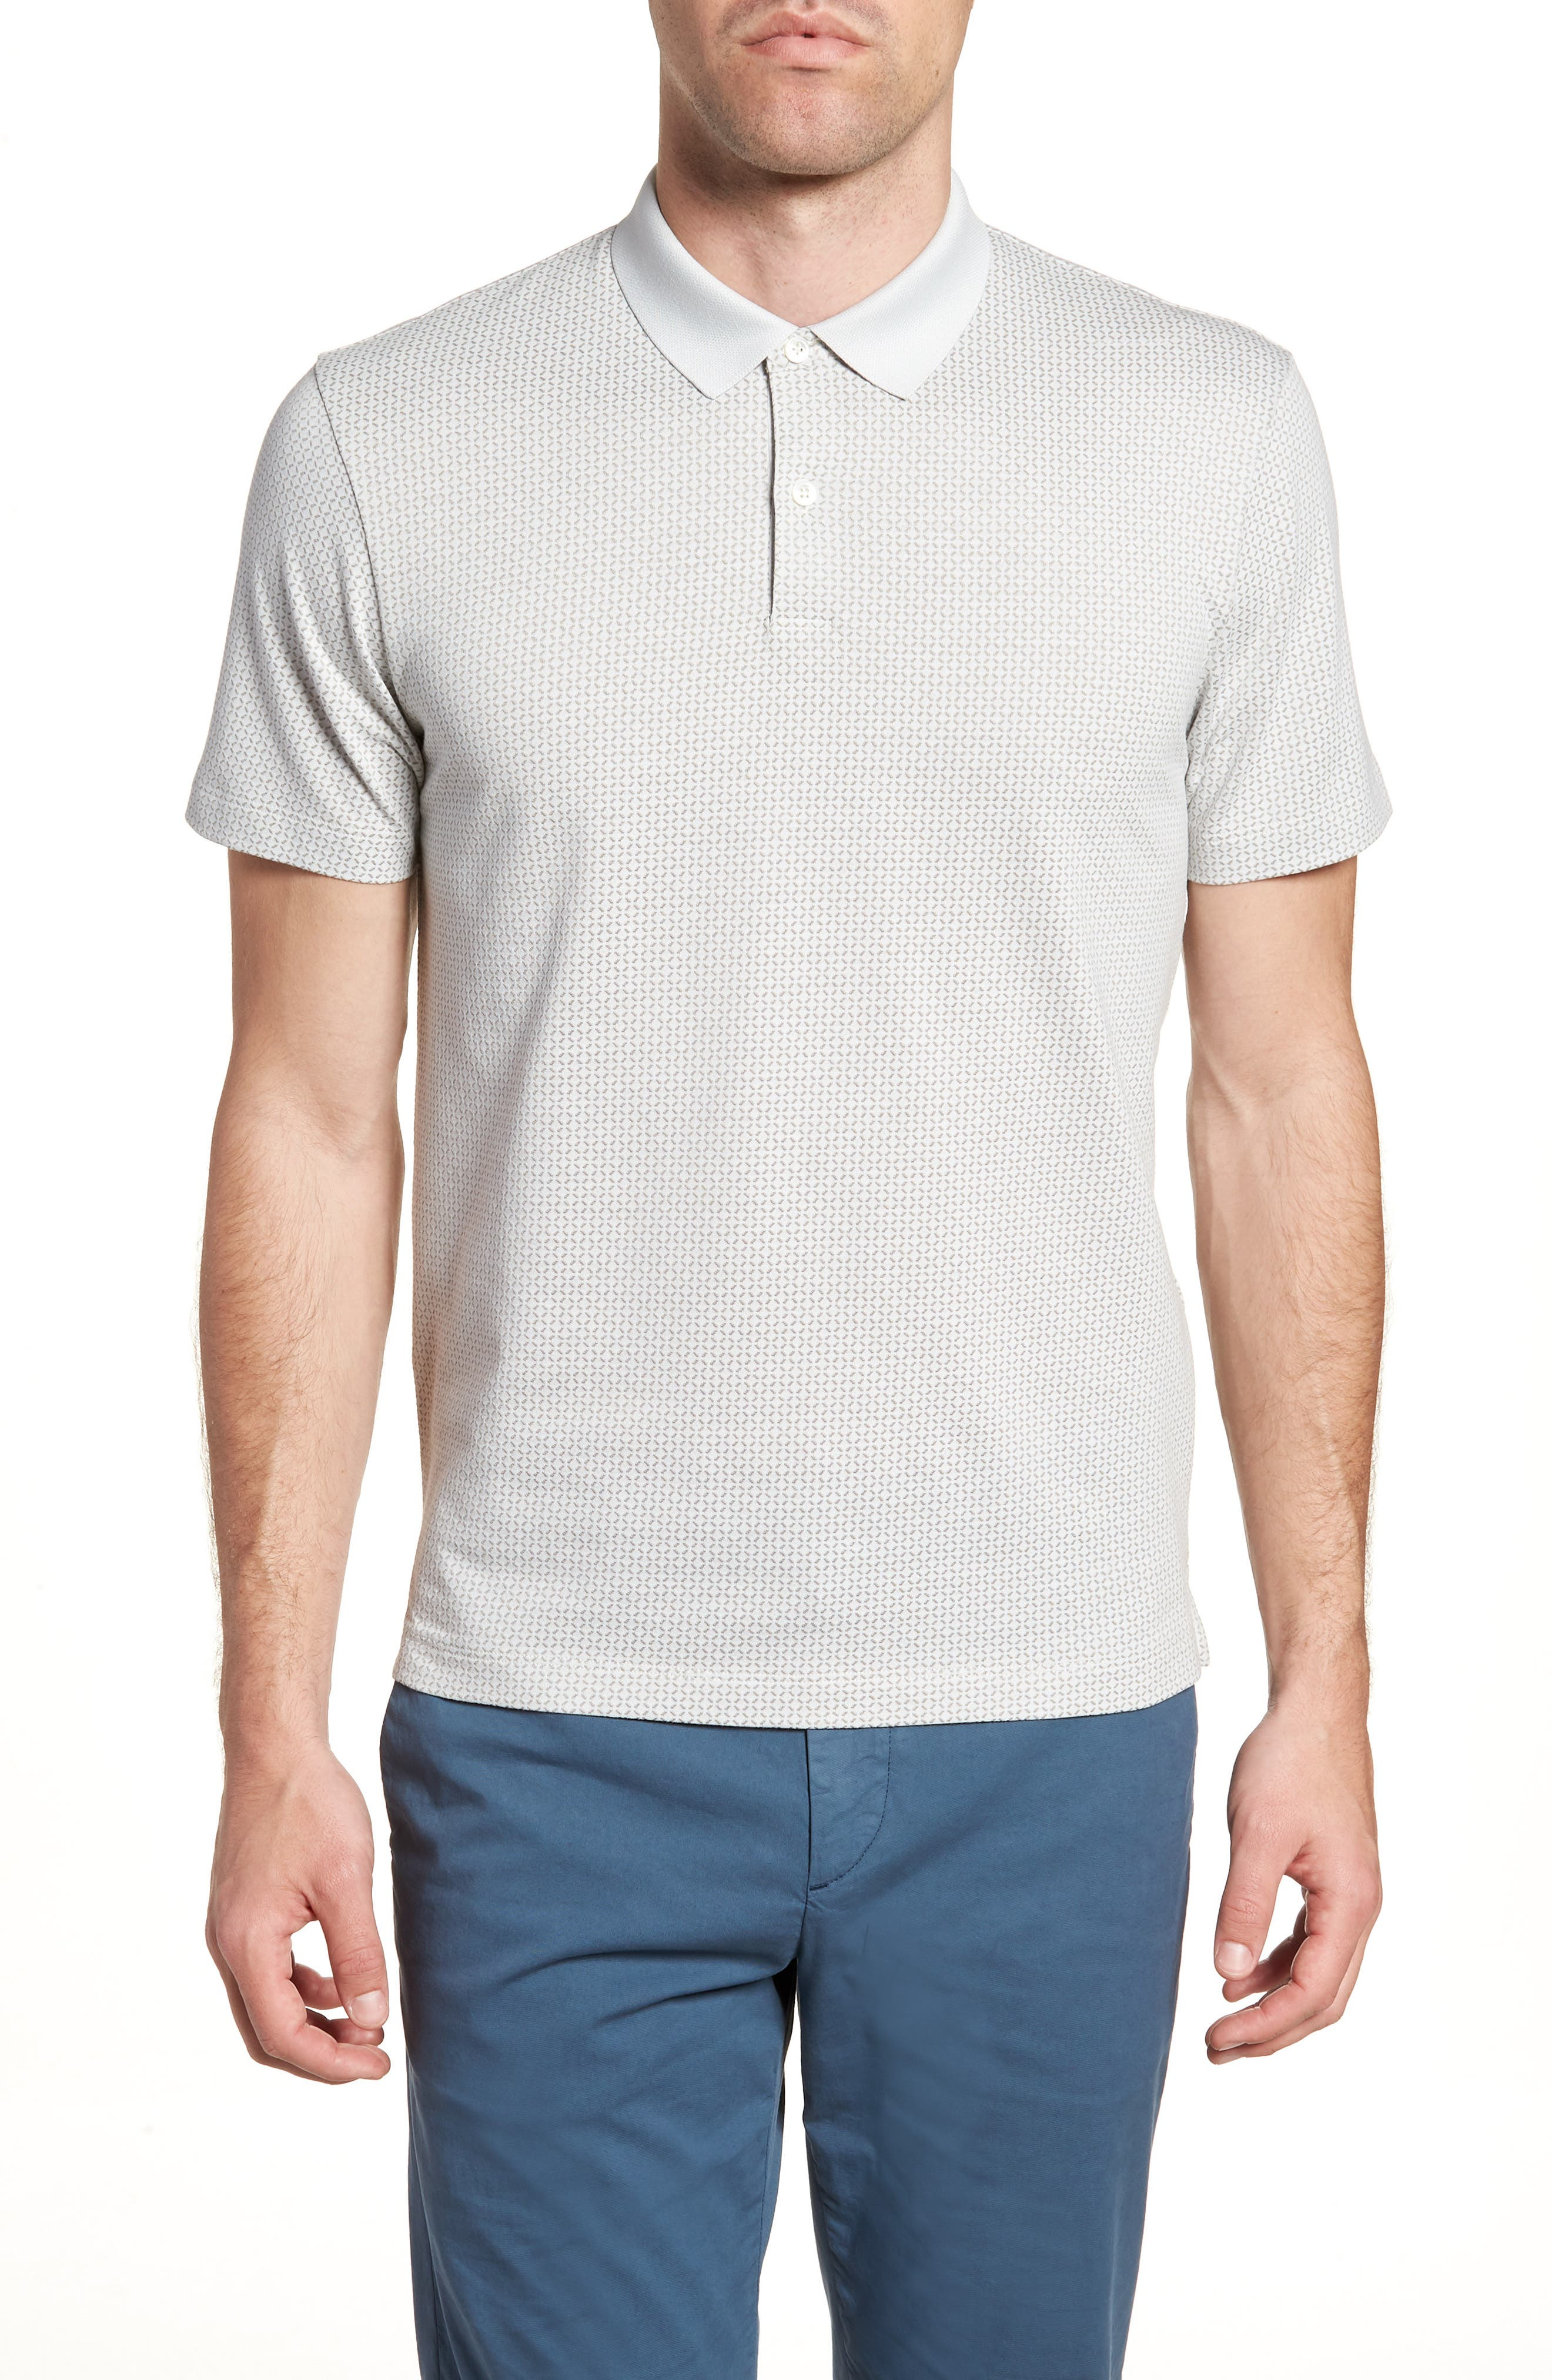 Sillar Slim Fit Polo,                         Main,                         color, GLAZE/ DIM